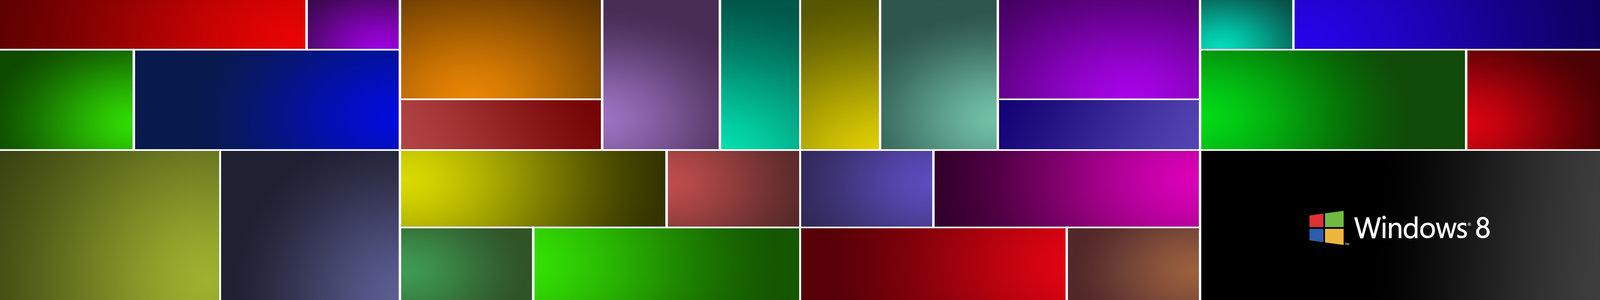 sunset wallpapers html filesize x1050 wallpapers hd desktop 3360 1050 1600x300